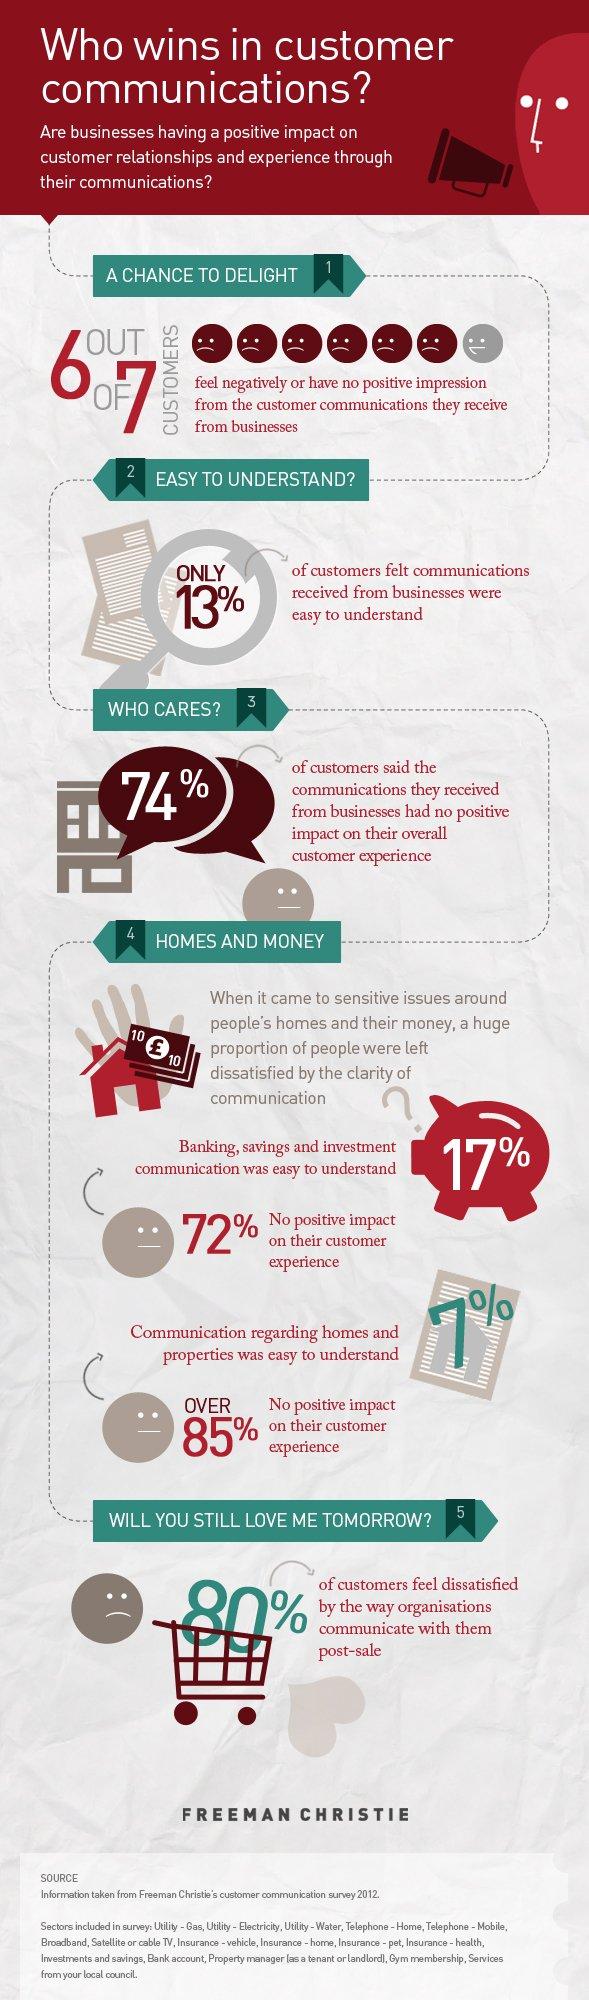 Customer communication infographic